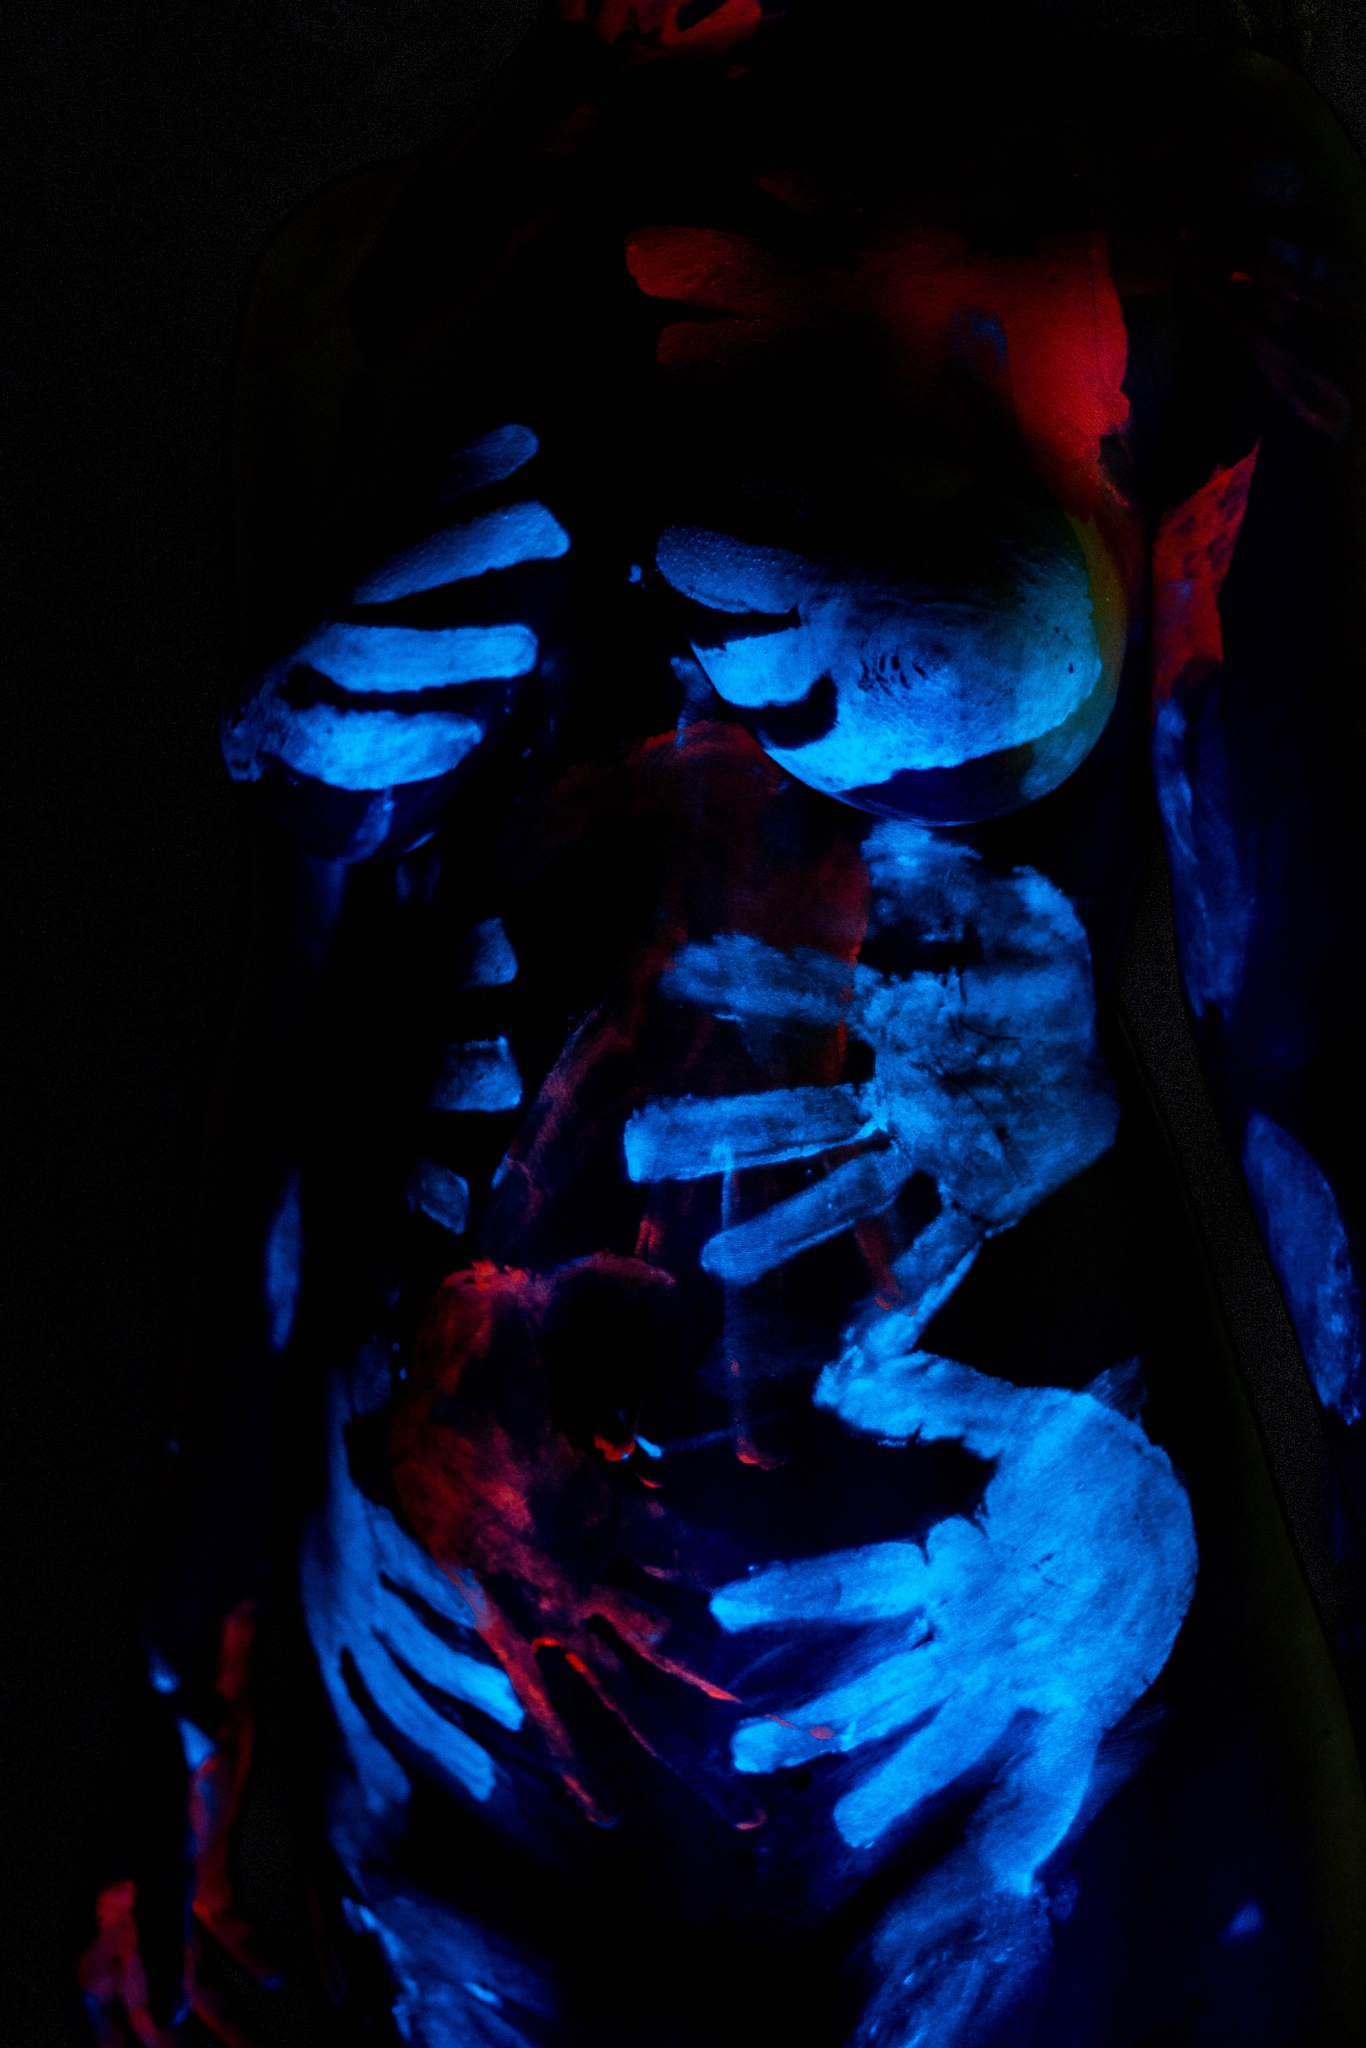 Glowing Body by Severin Messenbrink